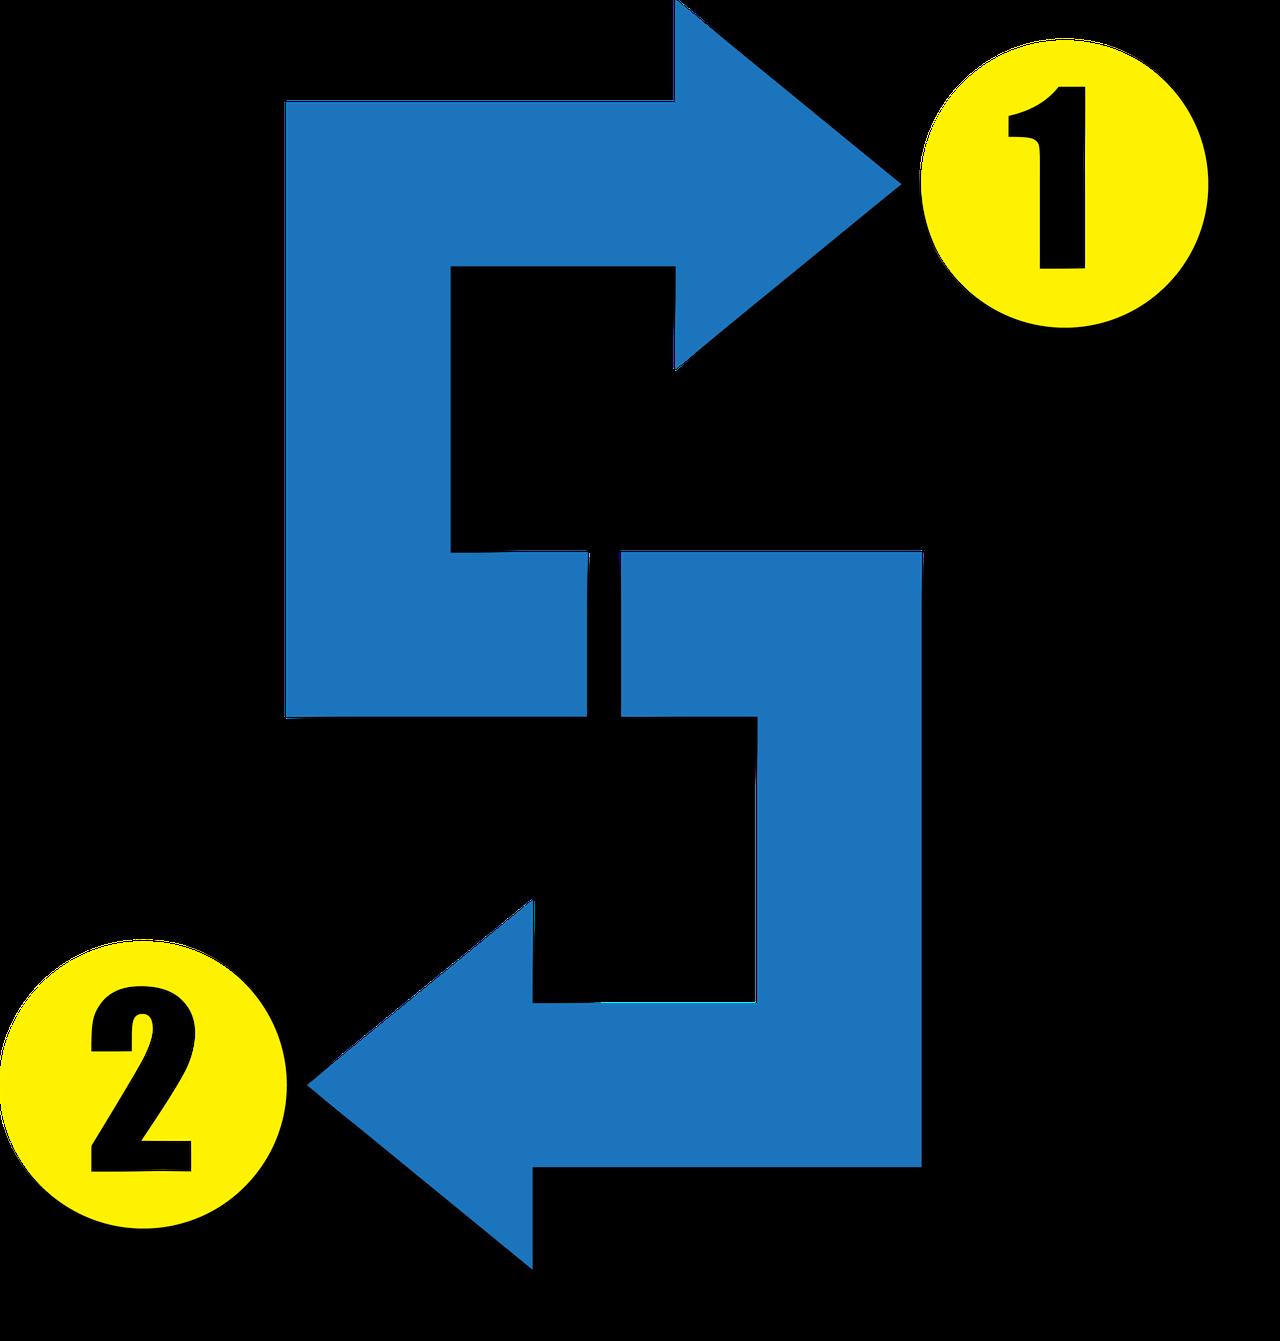 GCG Logo.png transparent background 5-13.png